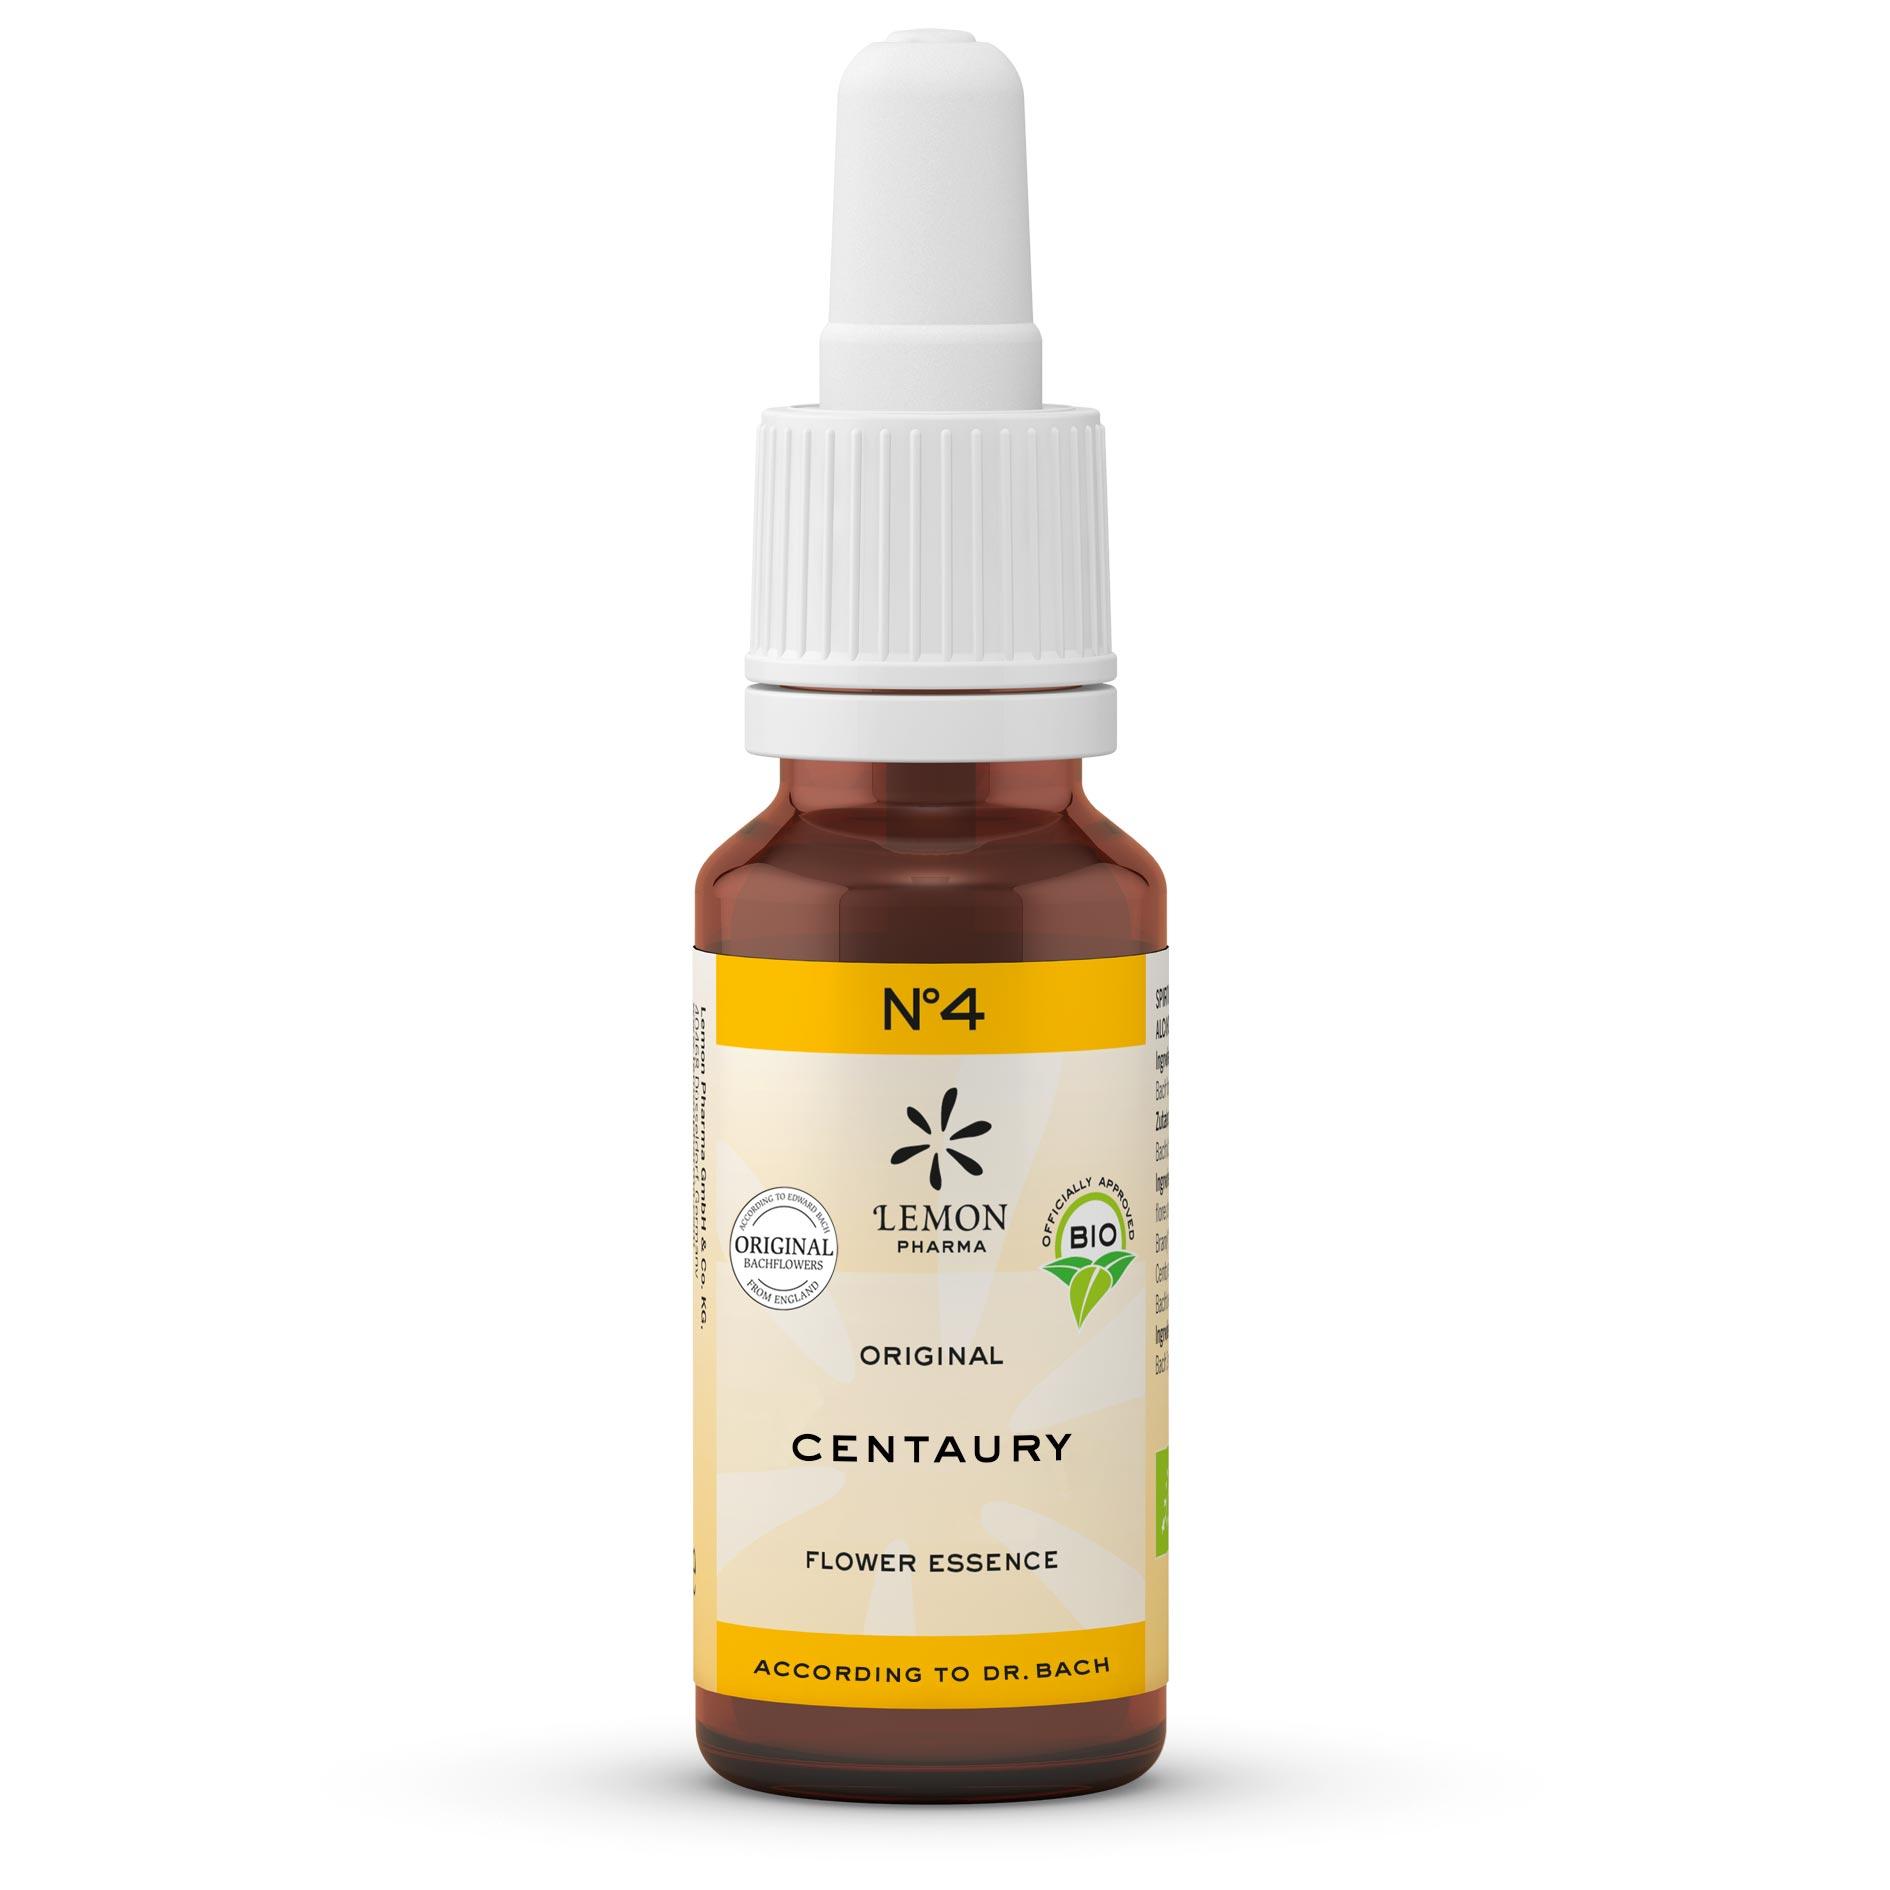 Fiori di Bach originali Lemon Pharma gocce Nr 4 Centaury centaurea capacità di autoaffermarsi